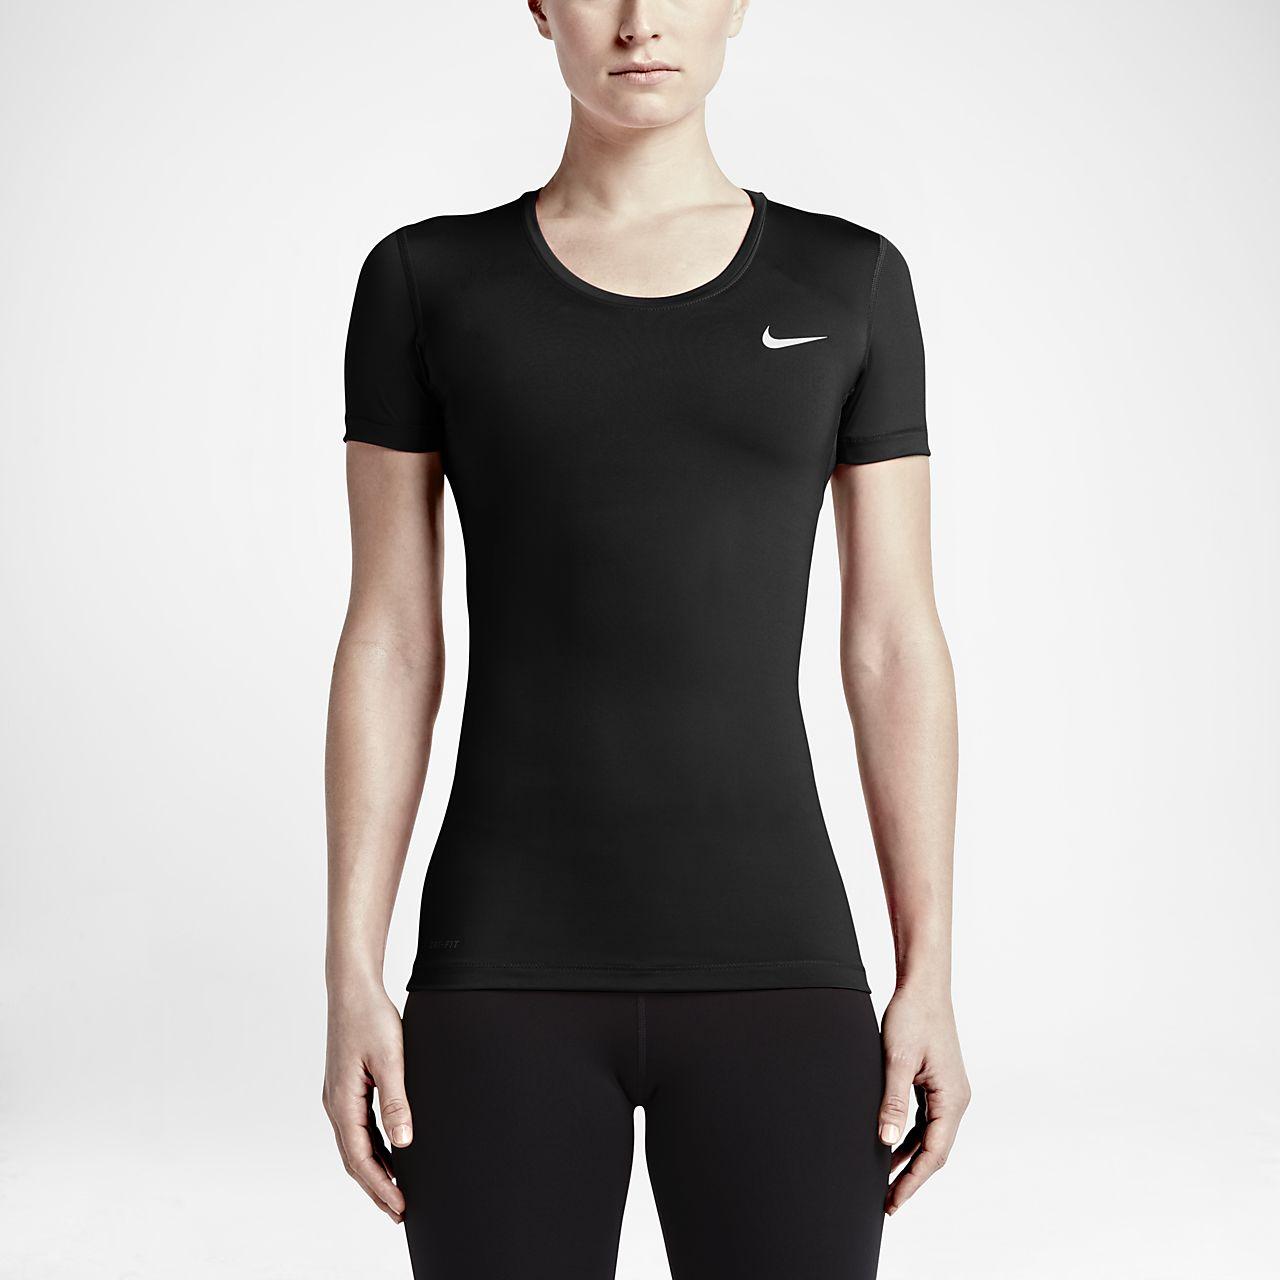 e0ccf0663312 Nike Pro Women s Short-Sleeve Training Top. Nike.com FI